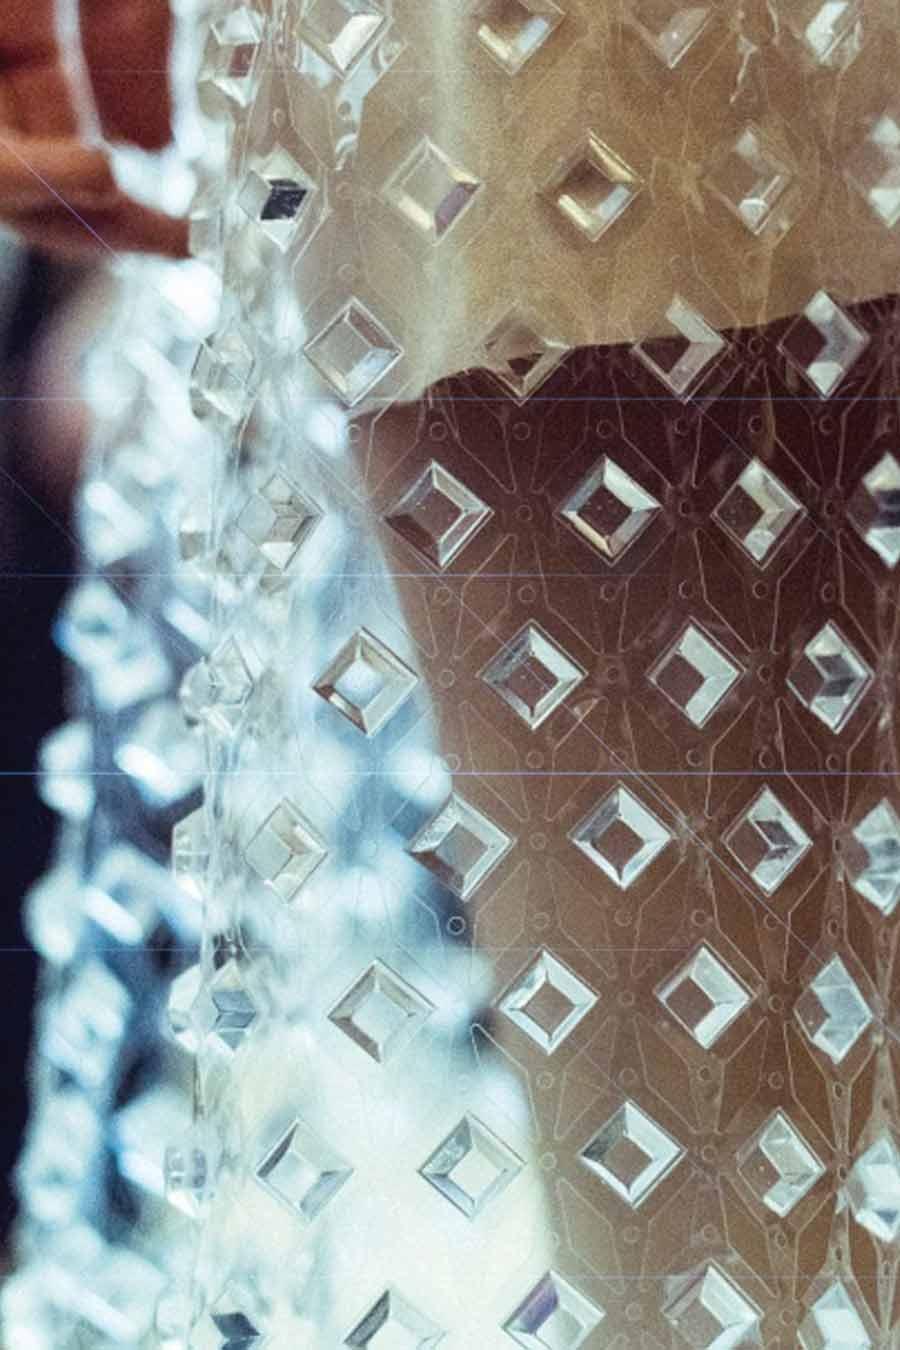 cristalli-look-iris-van-herpen-abito-trasparente-lungo-cristalli-dettaglio-foto-3